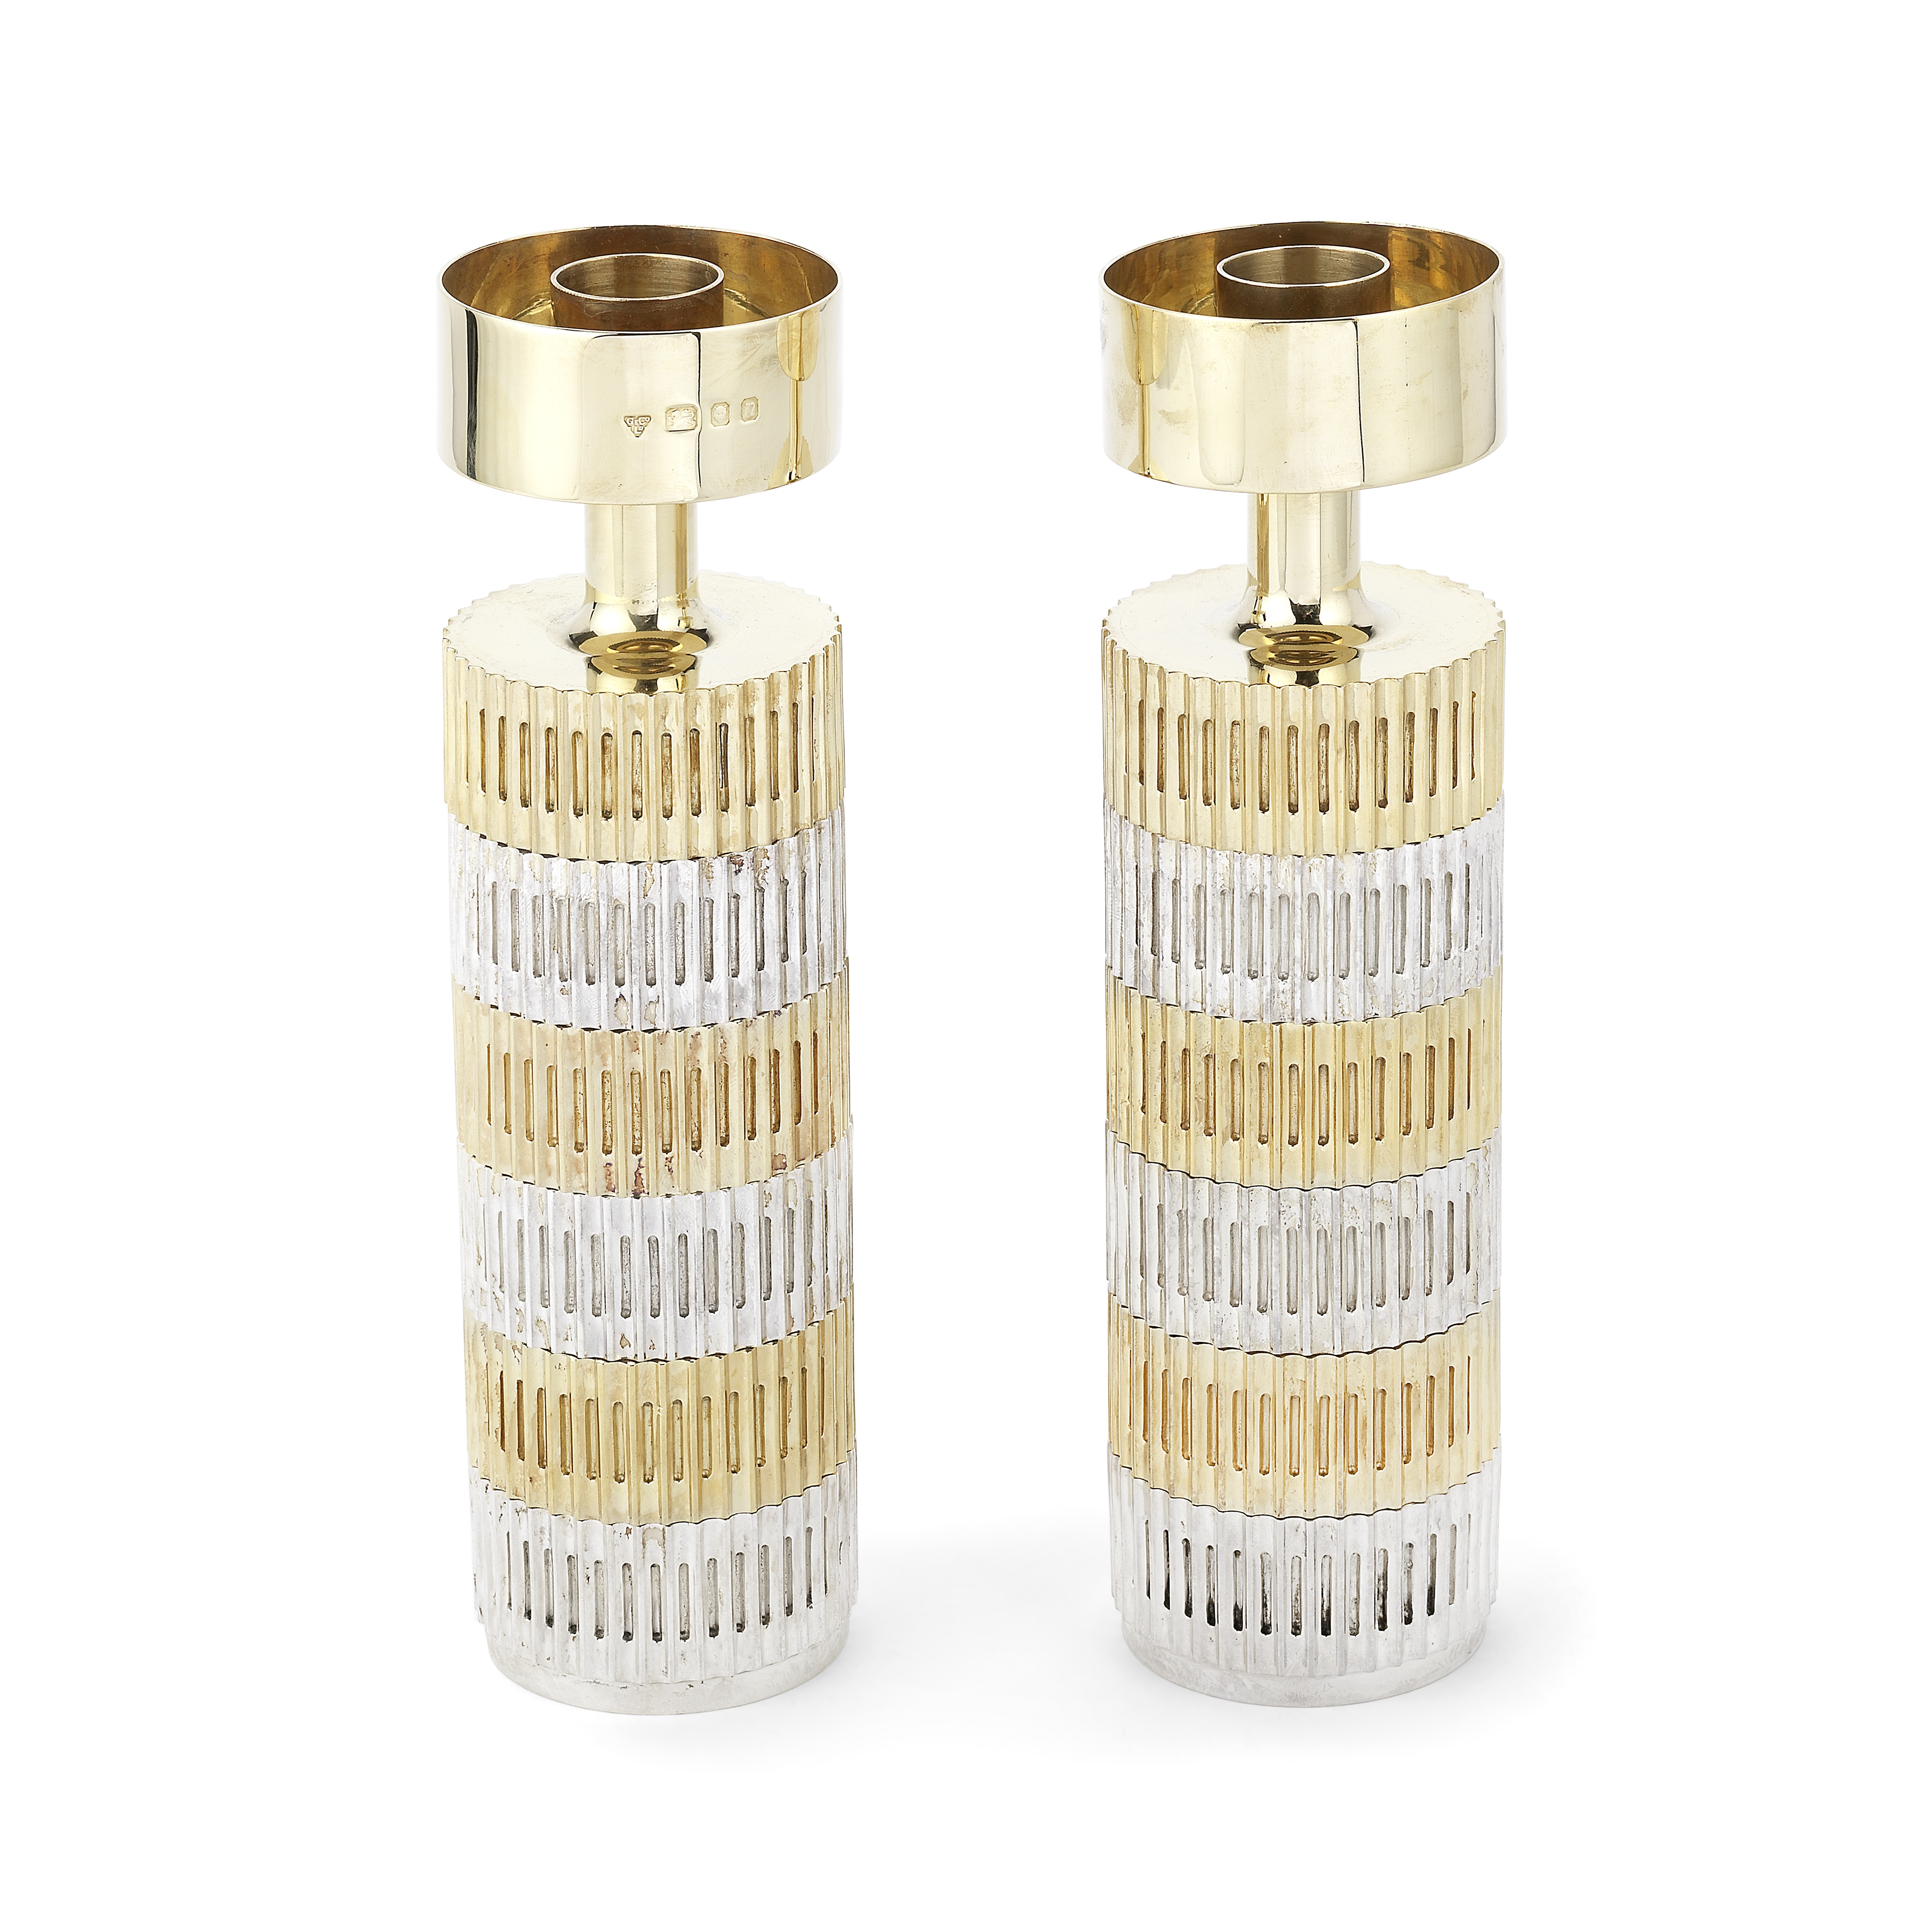 ALEX STYLES FOR GARRARD: an unusual pair of silver and silver-gilt candlesticks mark for Garrard ...